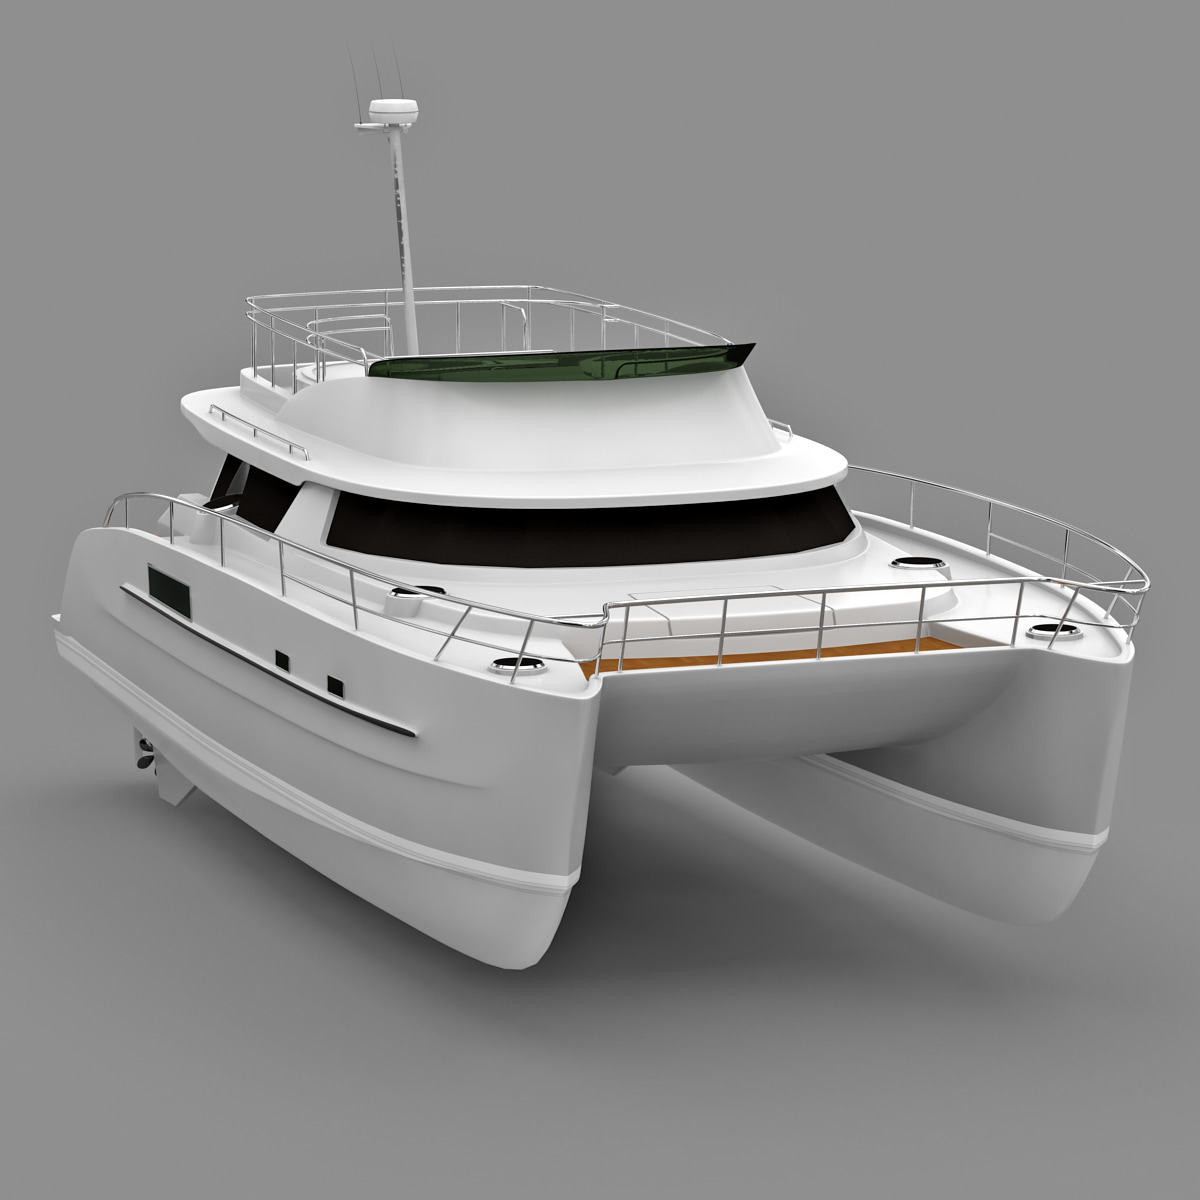 Cruise_Catamaran_Cumberland_44_001.jpg